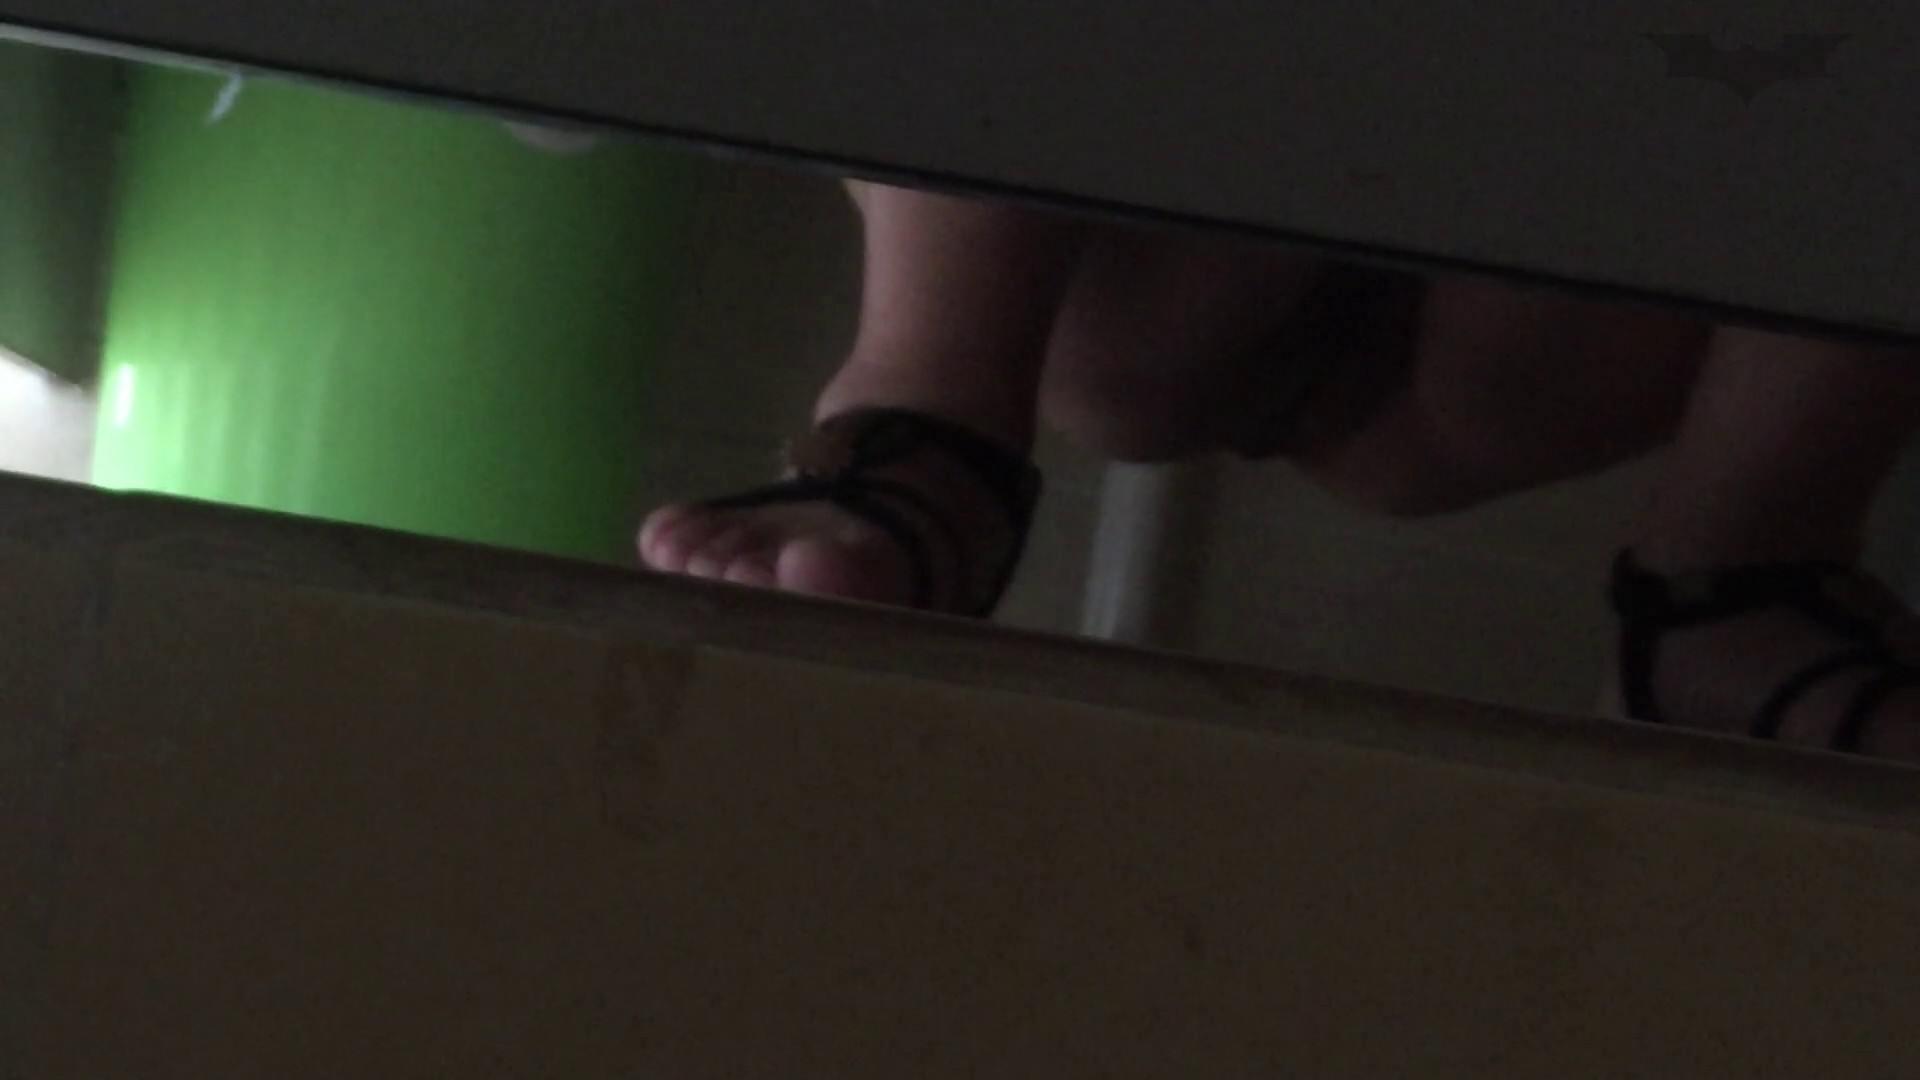 JD盗撮 美女の洗面所の秘密 Vol.73 ギャル攻め セックス画像 105画像 82